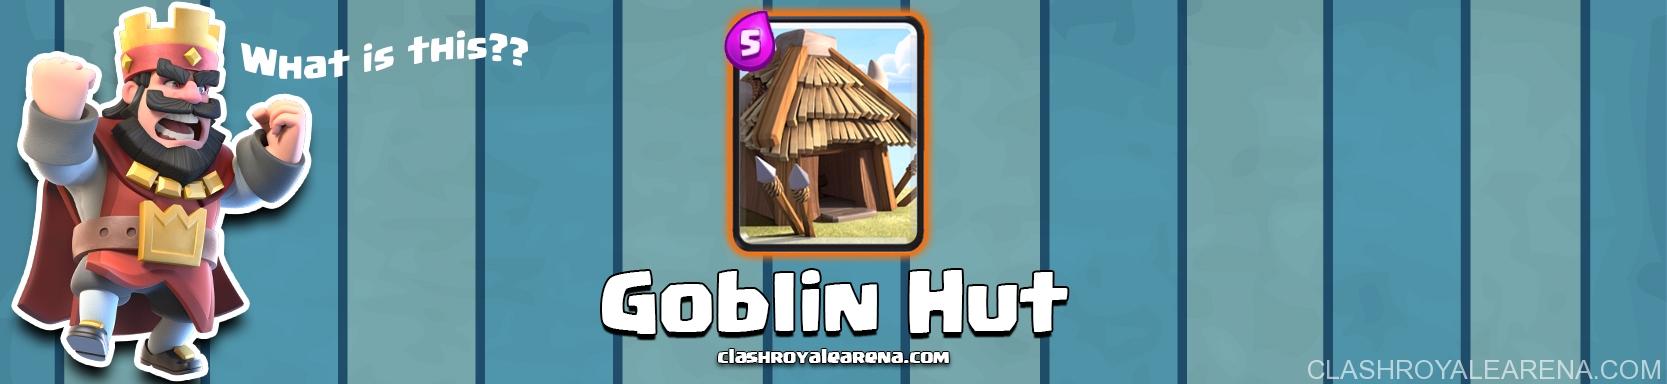 goblin-hut-clash-royale